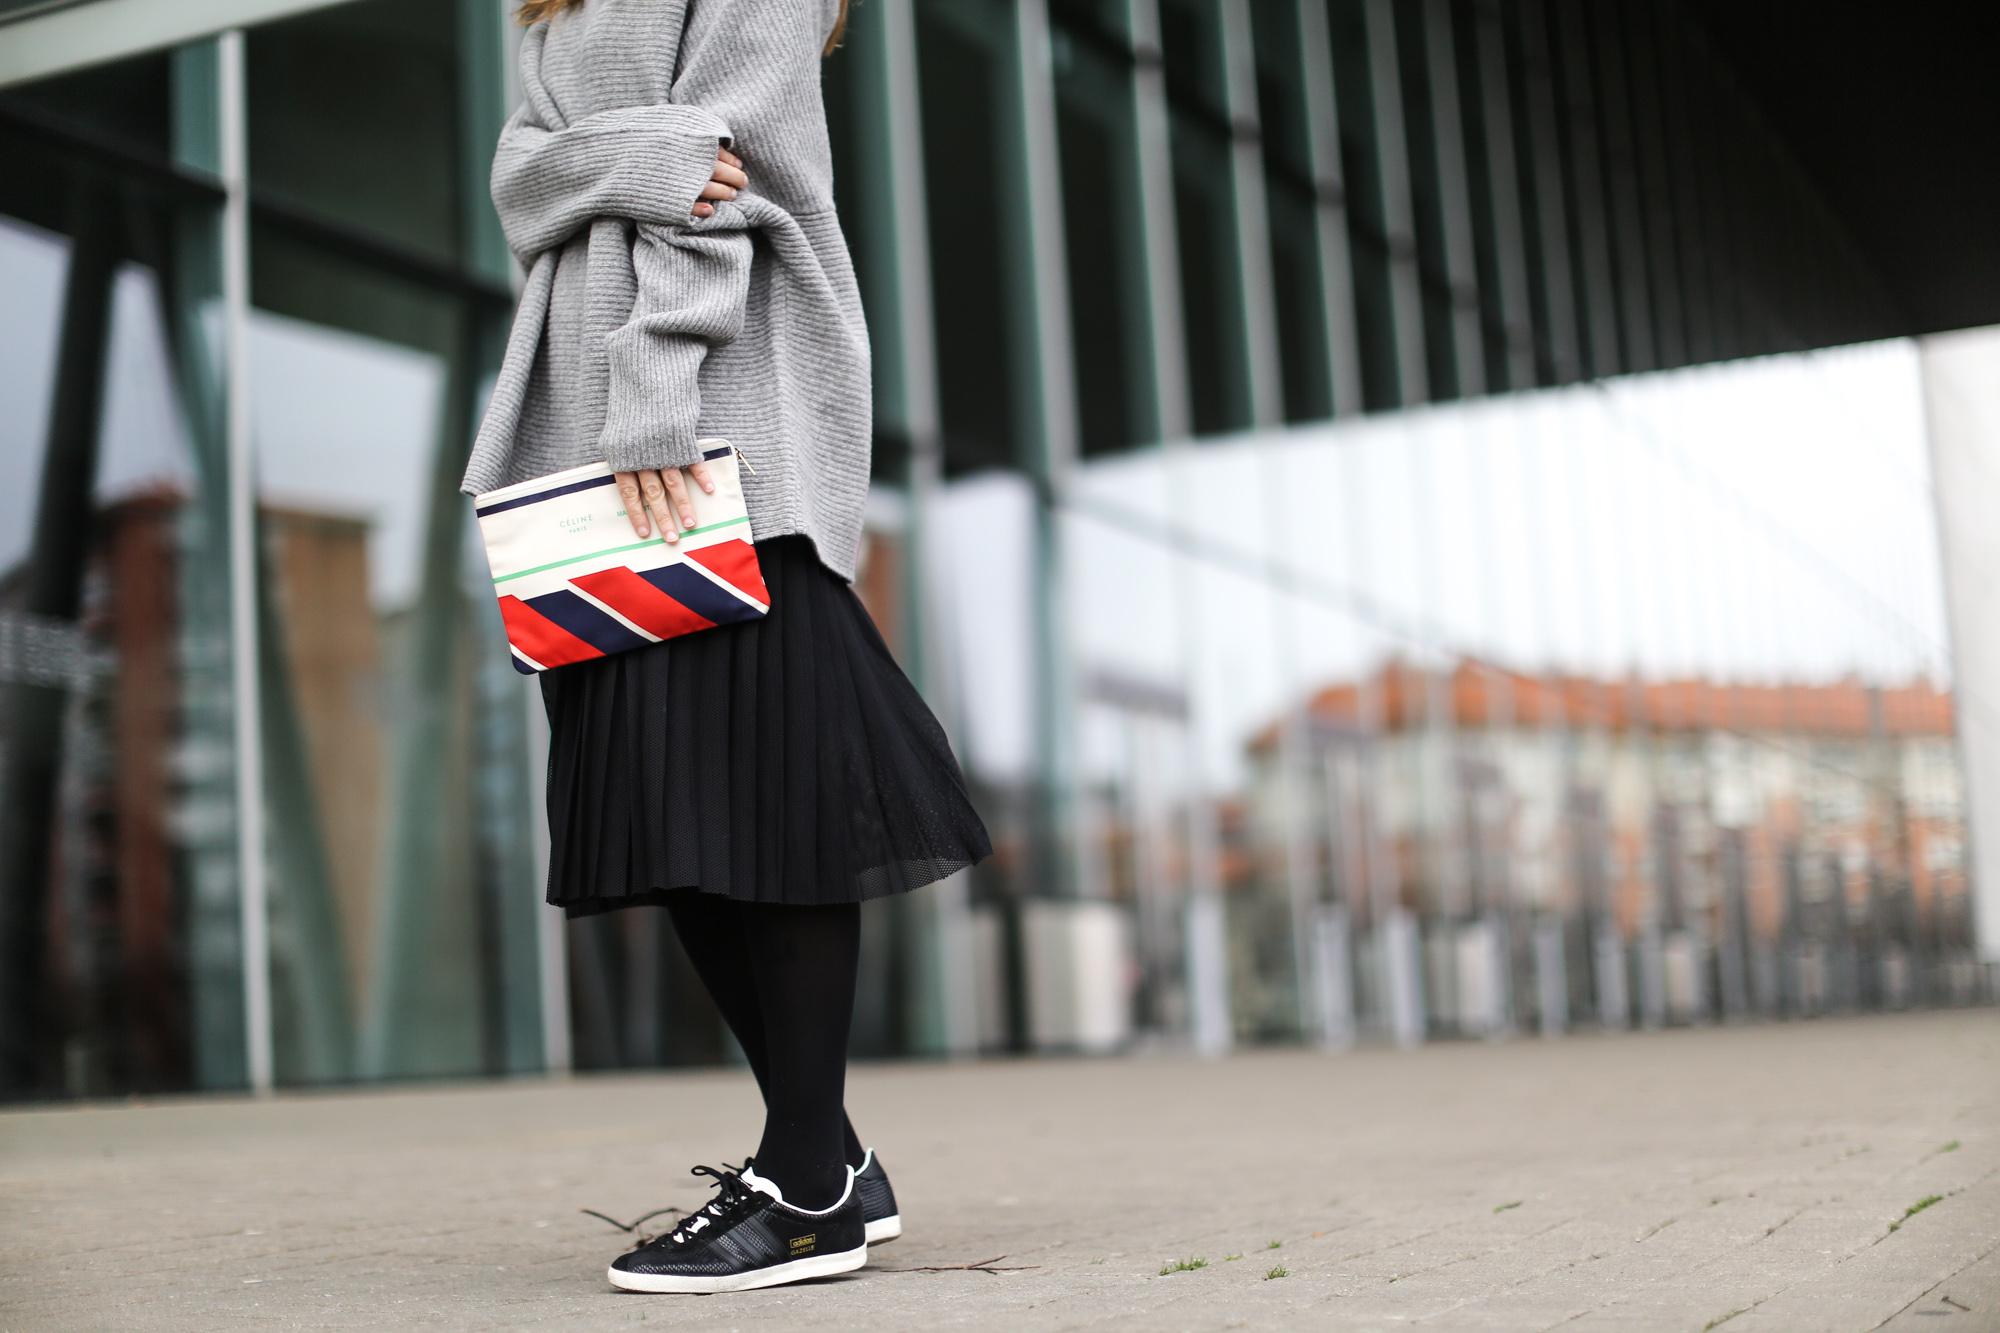 Clochet-streetstyle-zara-oversized-grey-knit-adidas-gazelle-suiteblanco-falda-plisada-celine-paris-clutch-4